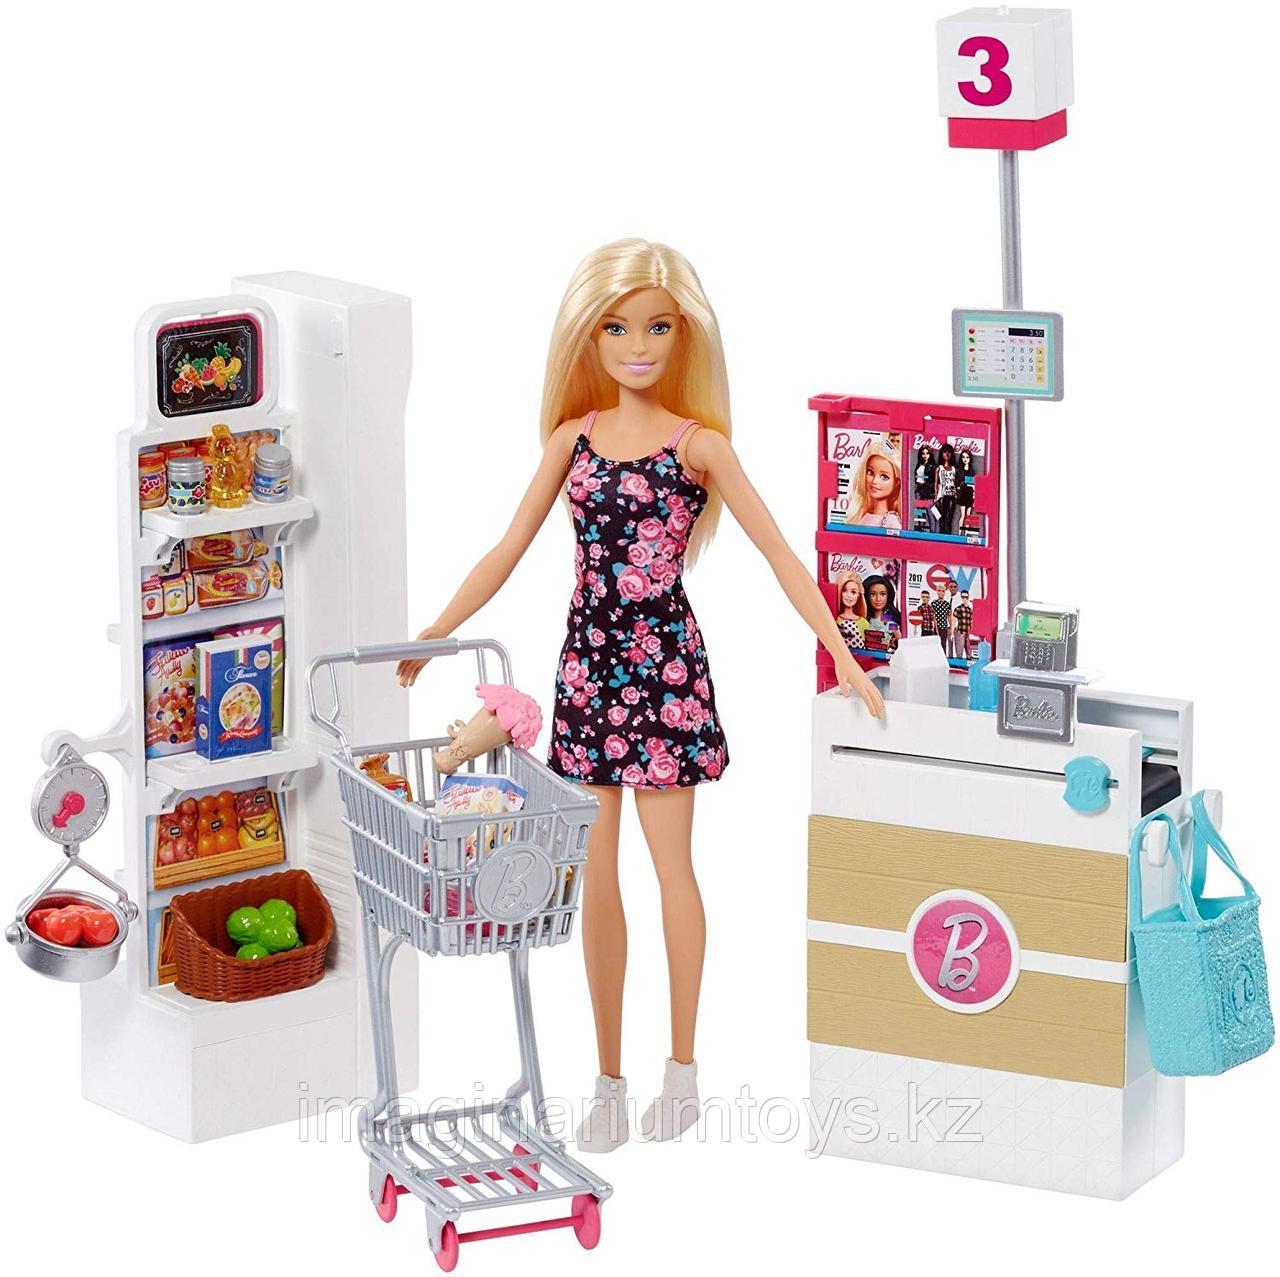 Barbie Игровой набор Супермаркет Барби